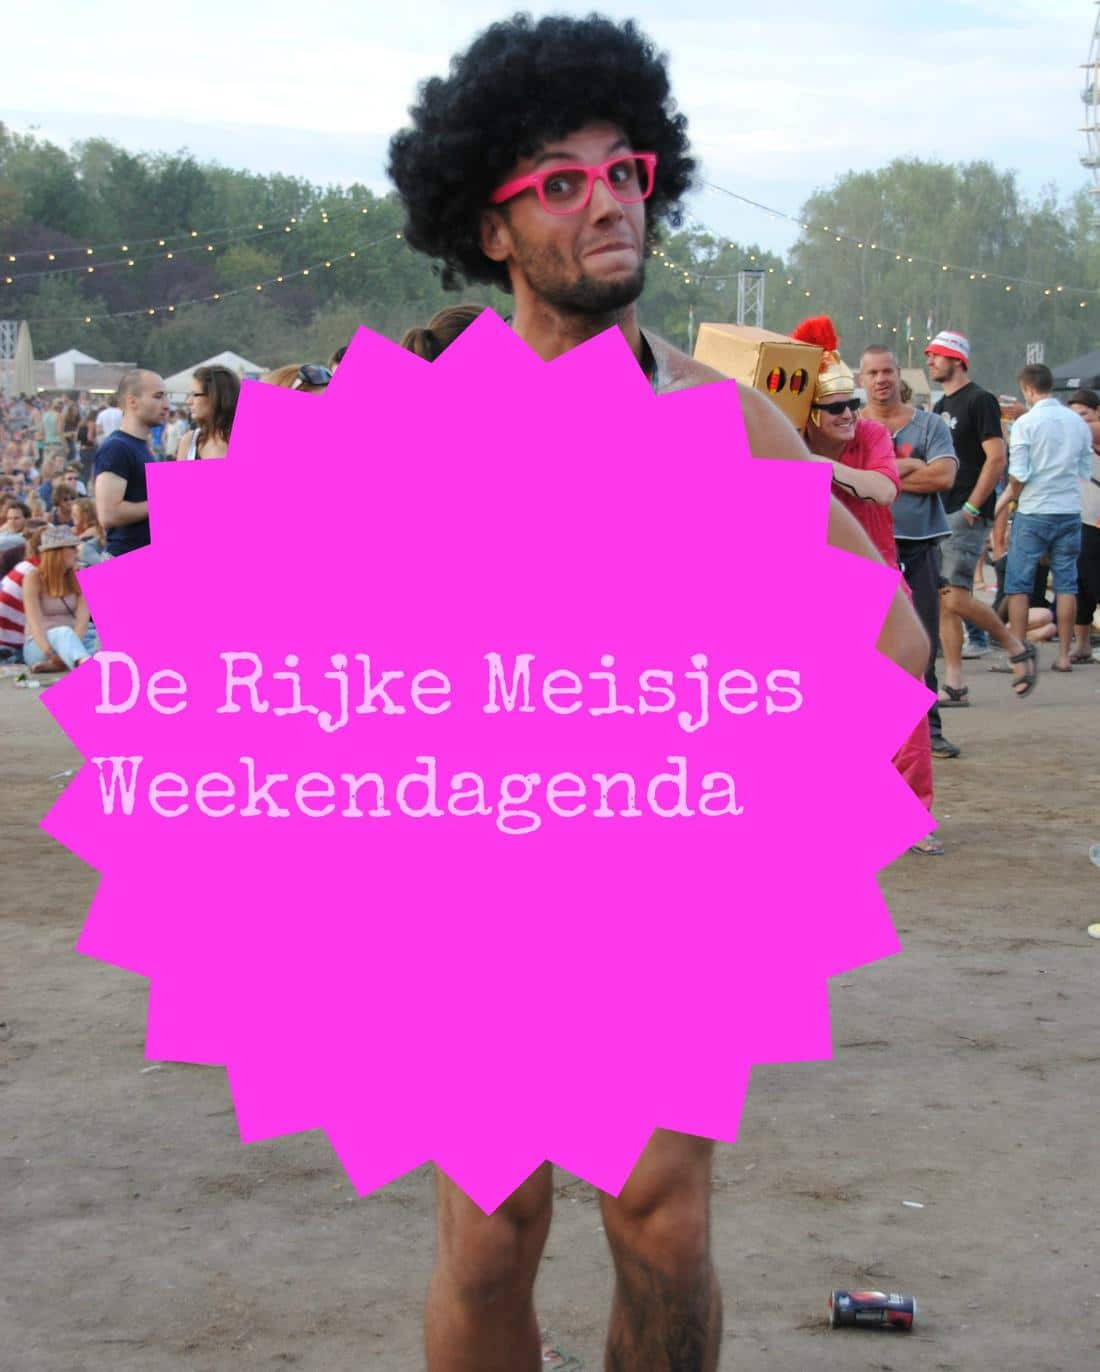 Weekendagenda logo 4